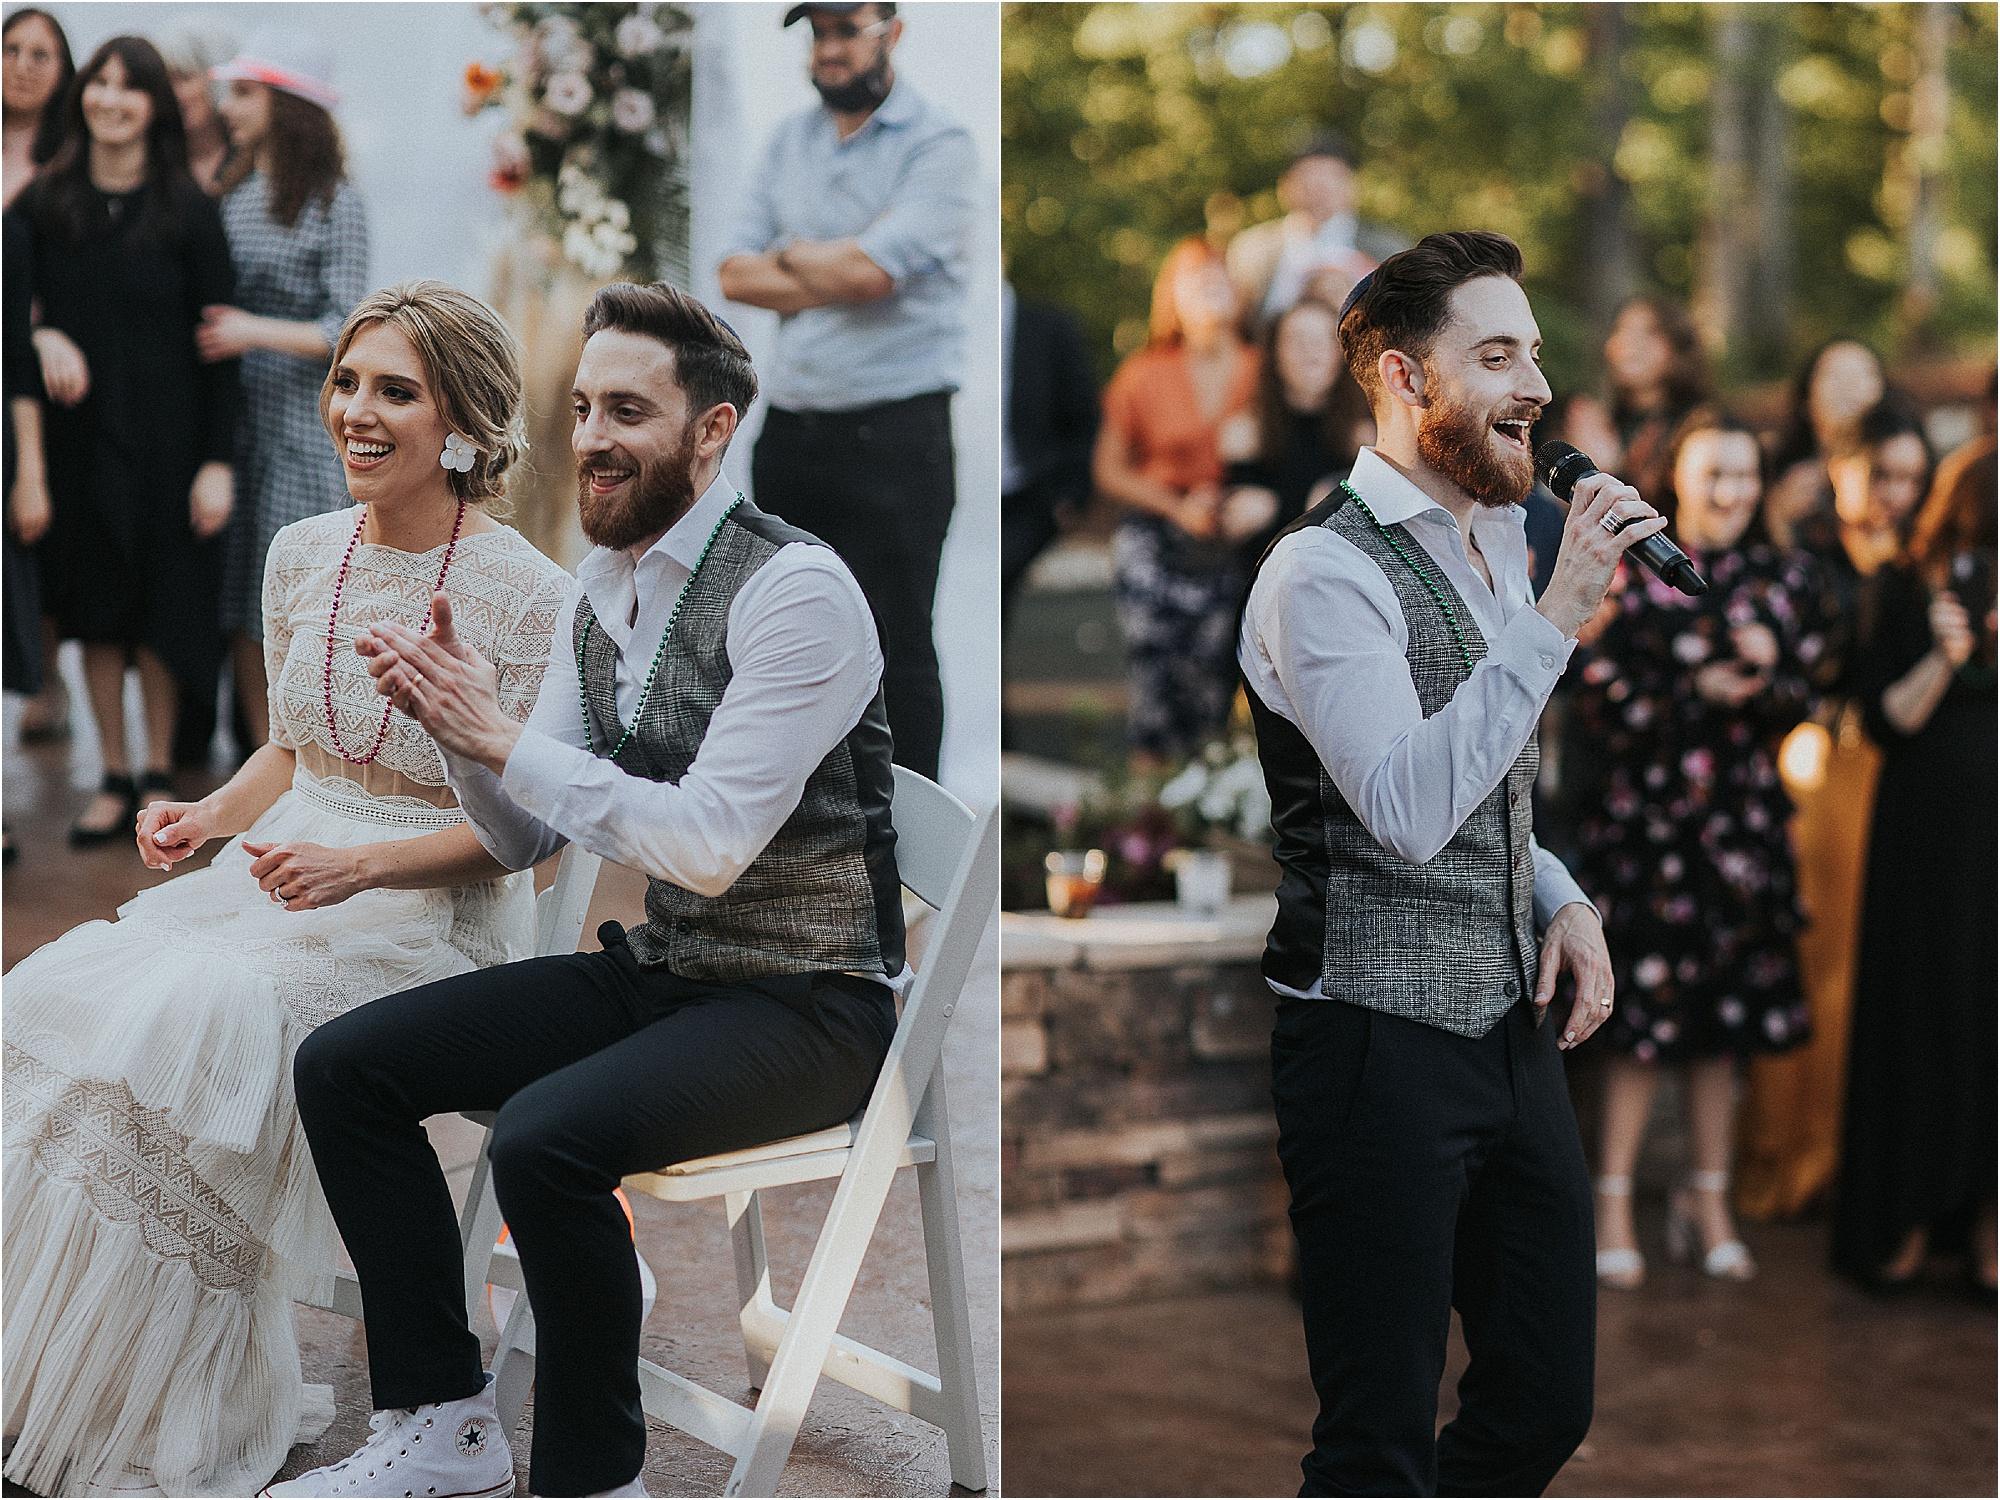 celebrating at a Jewish Wedding Reception